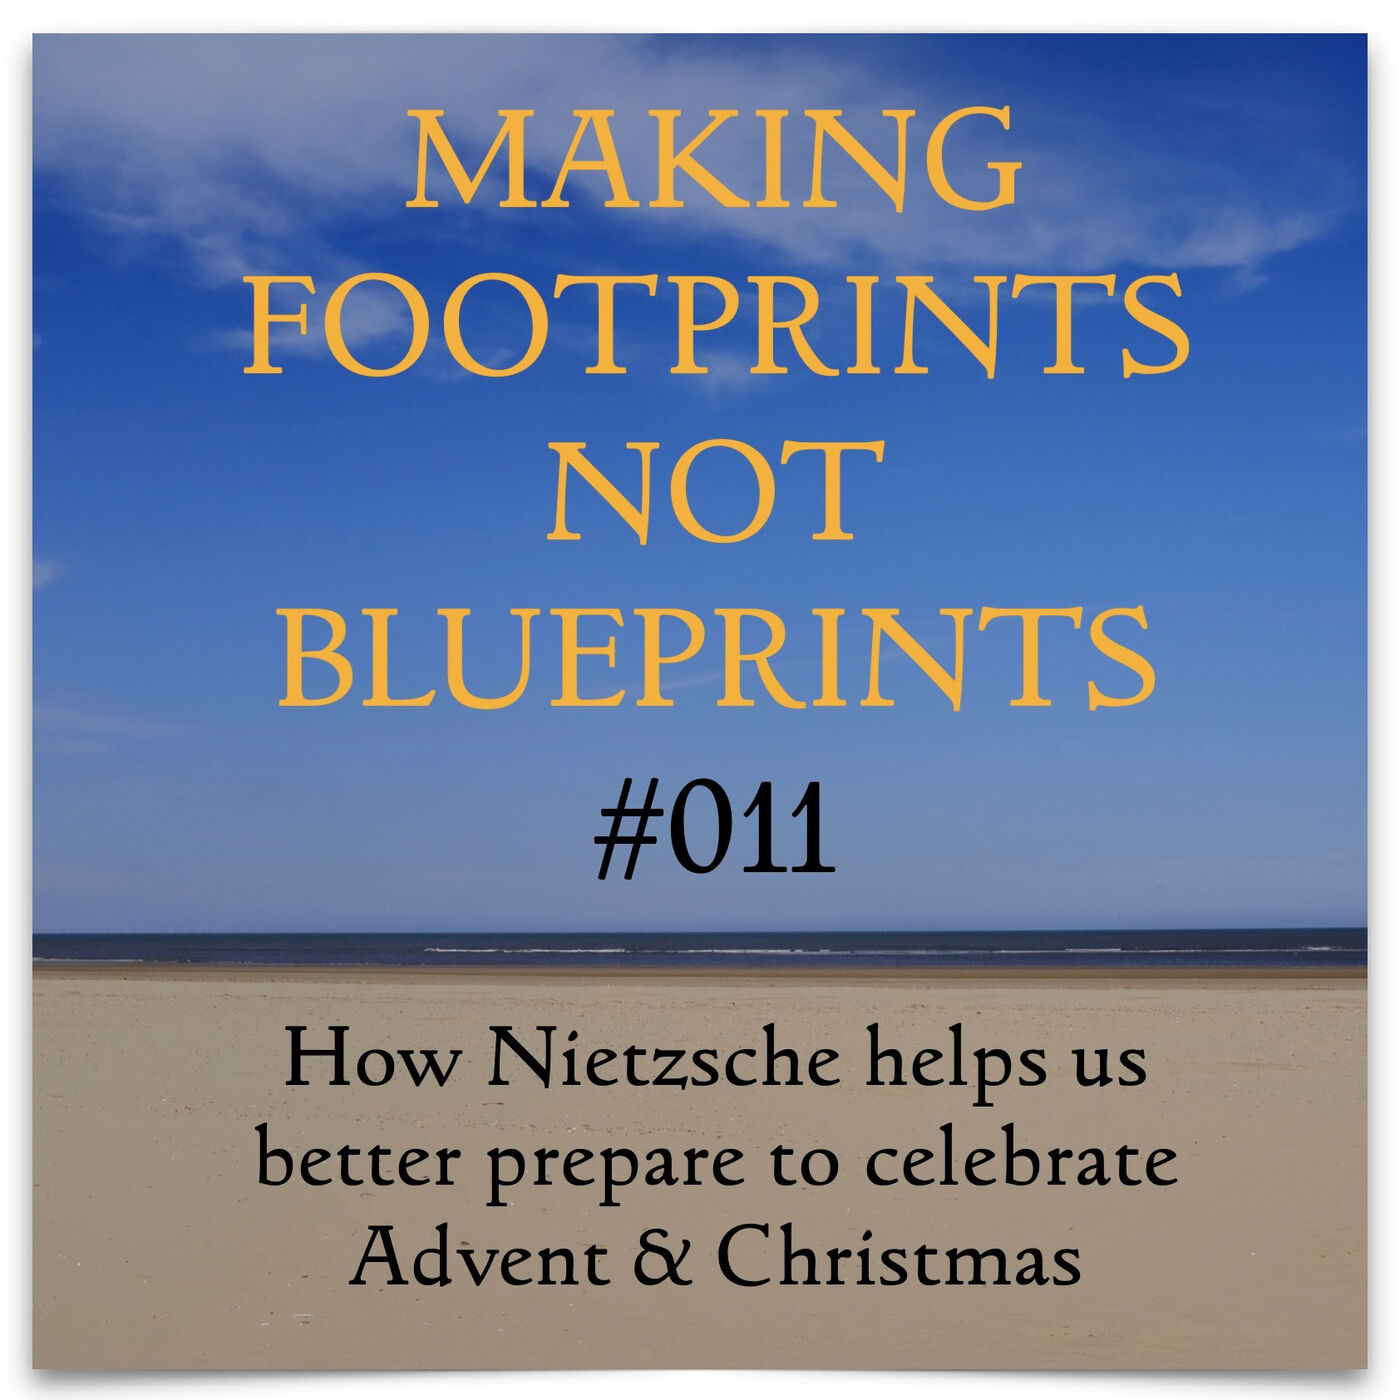 S01 #011 - How Nietzsche helps us better prepare to celebrate Advent & Christmas